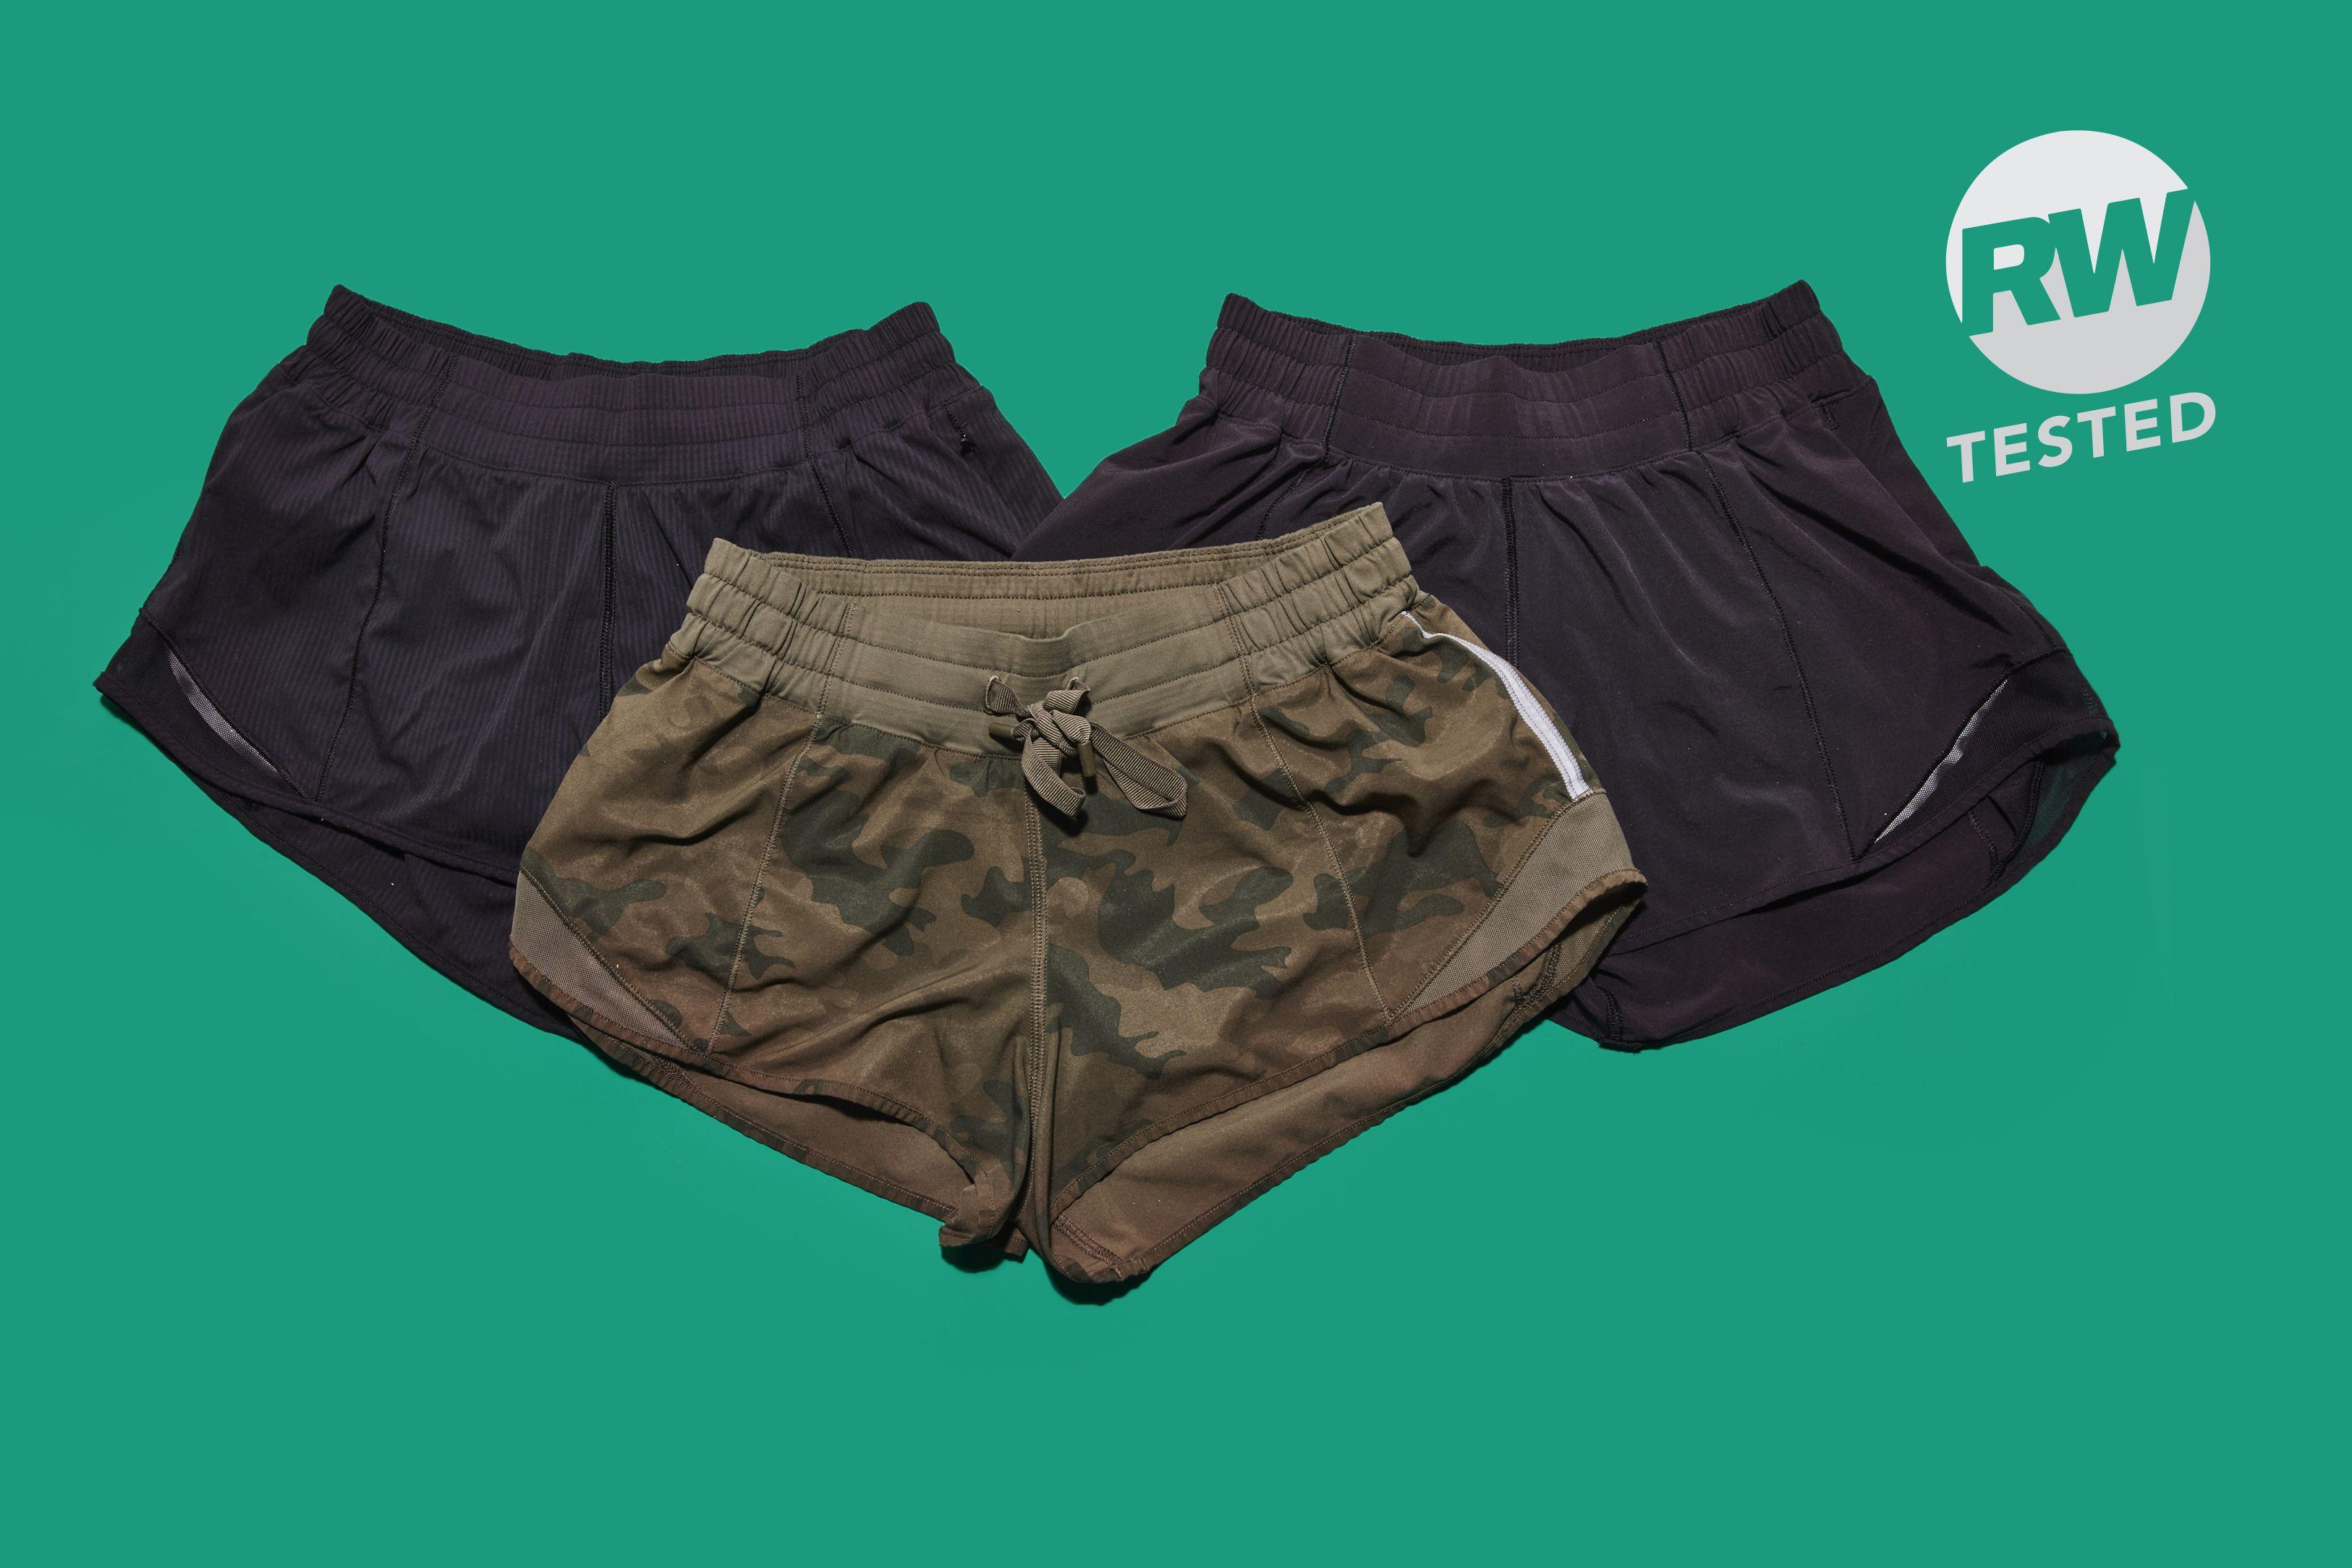 cc1e6cf33b96 Womens Sweat Proof Underwear